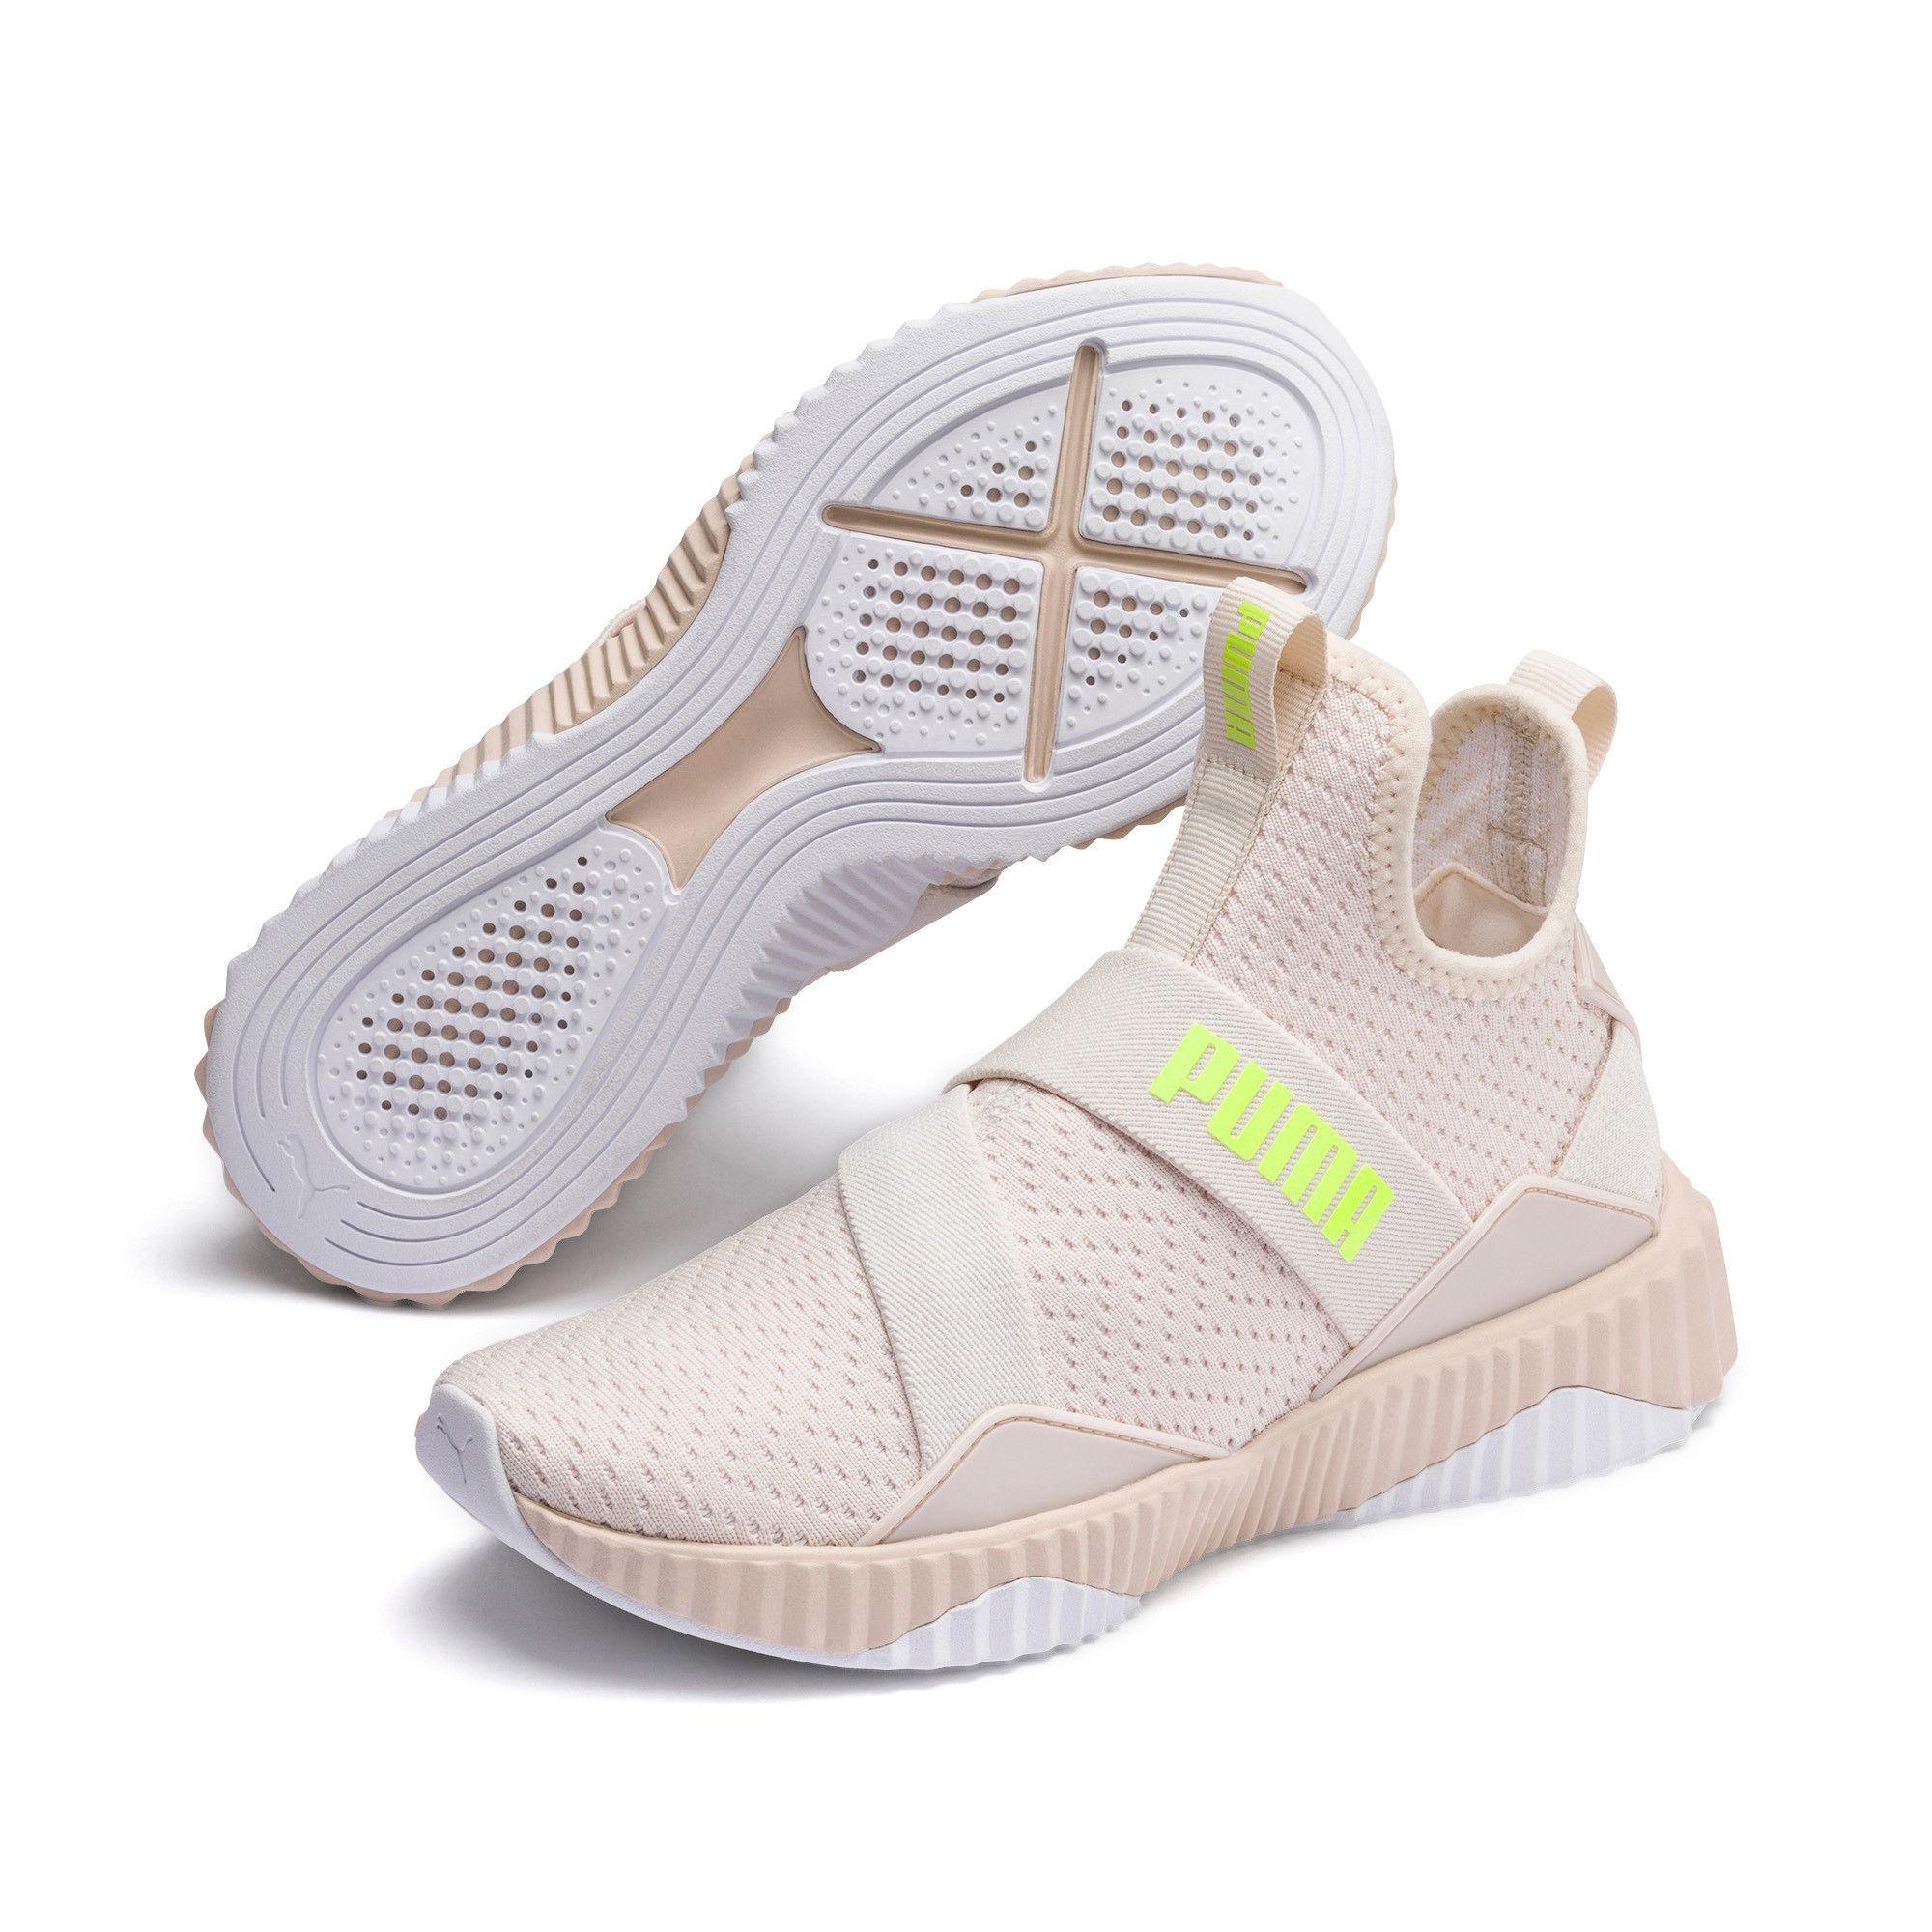 Puma Defy Mid Core Women's Shoes - Nude